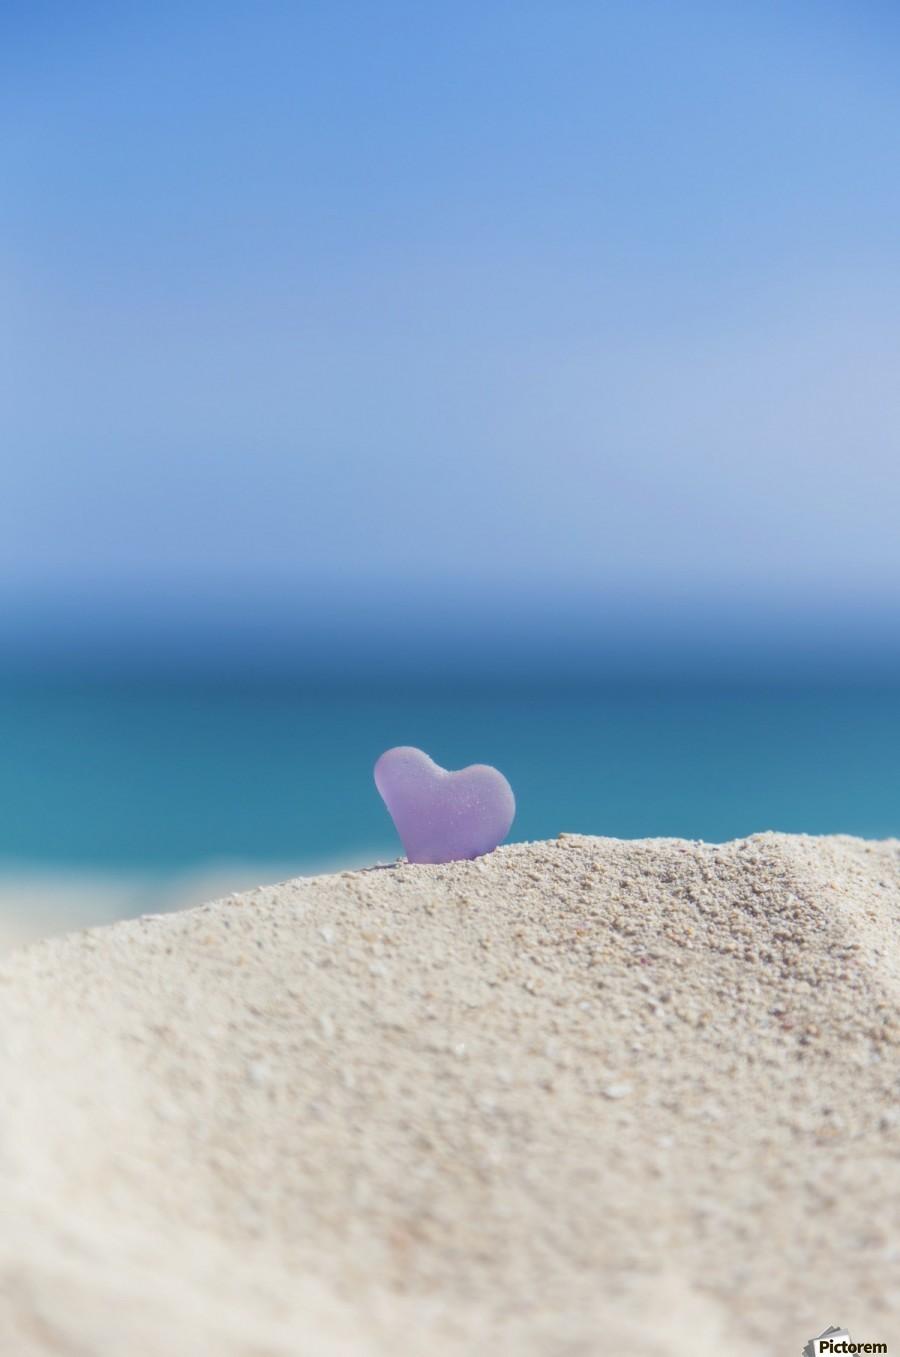 A lavender heart shaped sea glass in the sand at the beach; Honolulu, Oahu, Hawaii, United States of America  Print